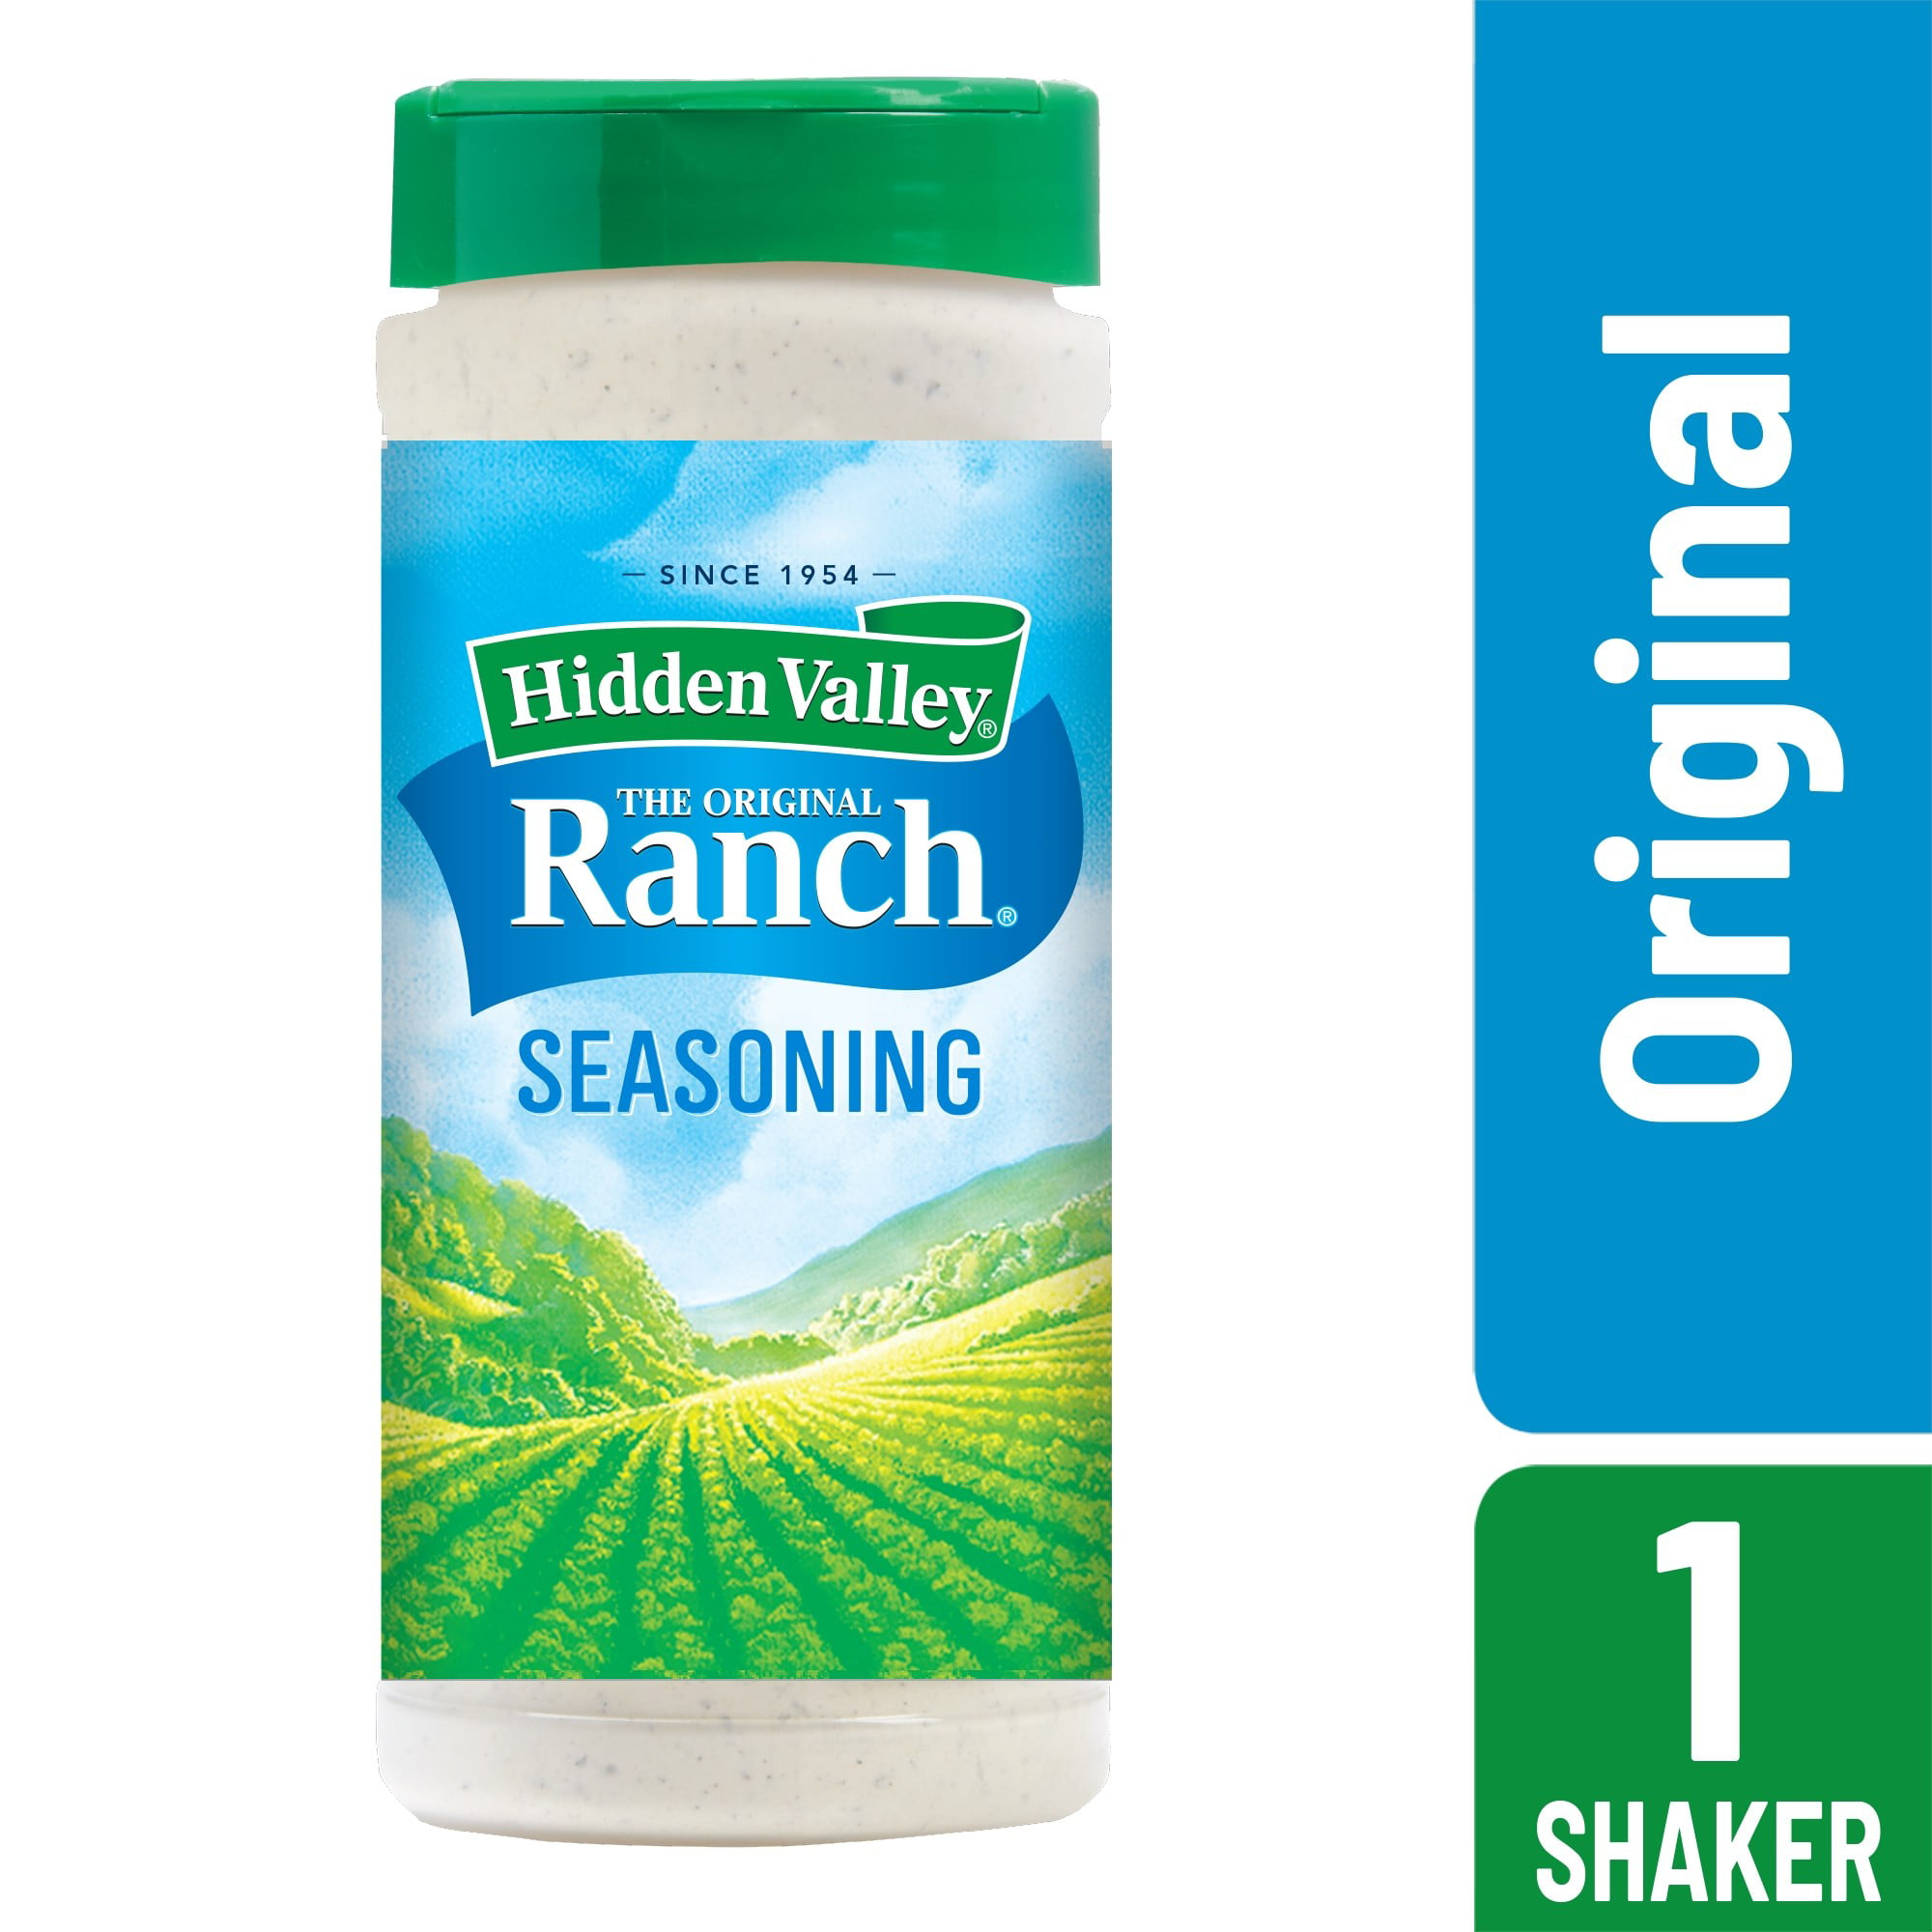 Hidden Valley Original Ranch Salad Dressing Seasoning Mix Gluten Free Keto Friendly 1 Canister Walmart Com Walmart Com